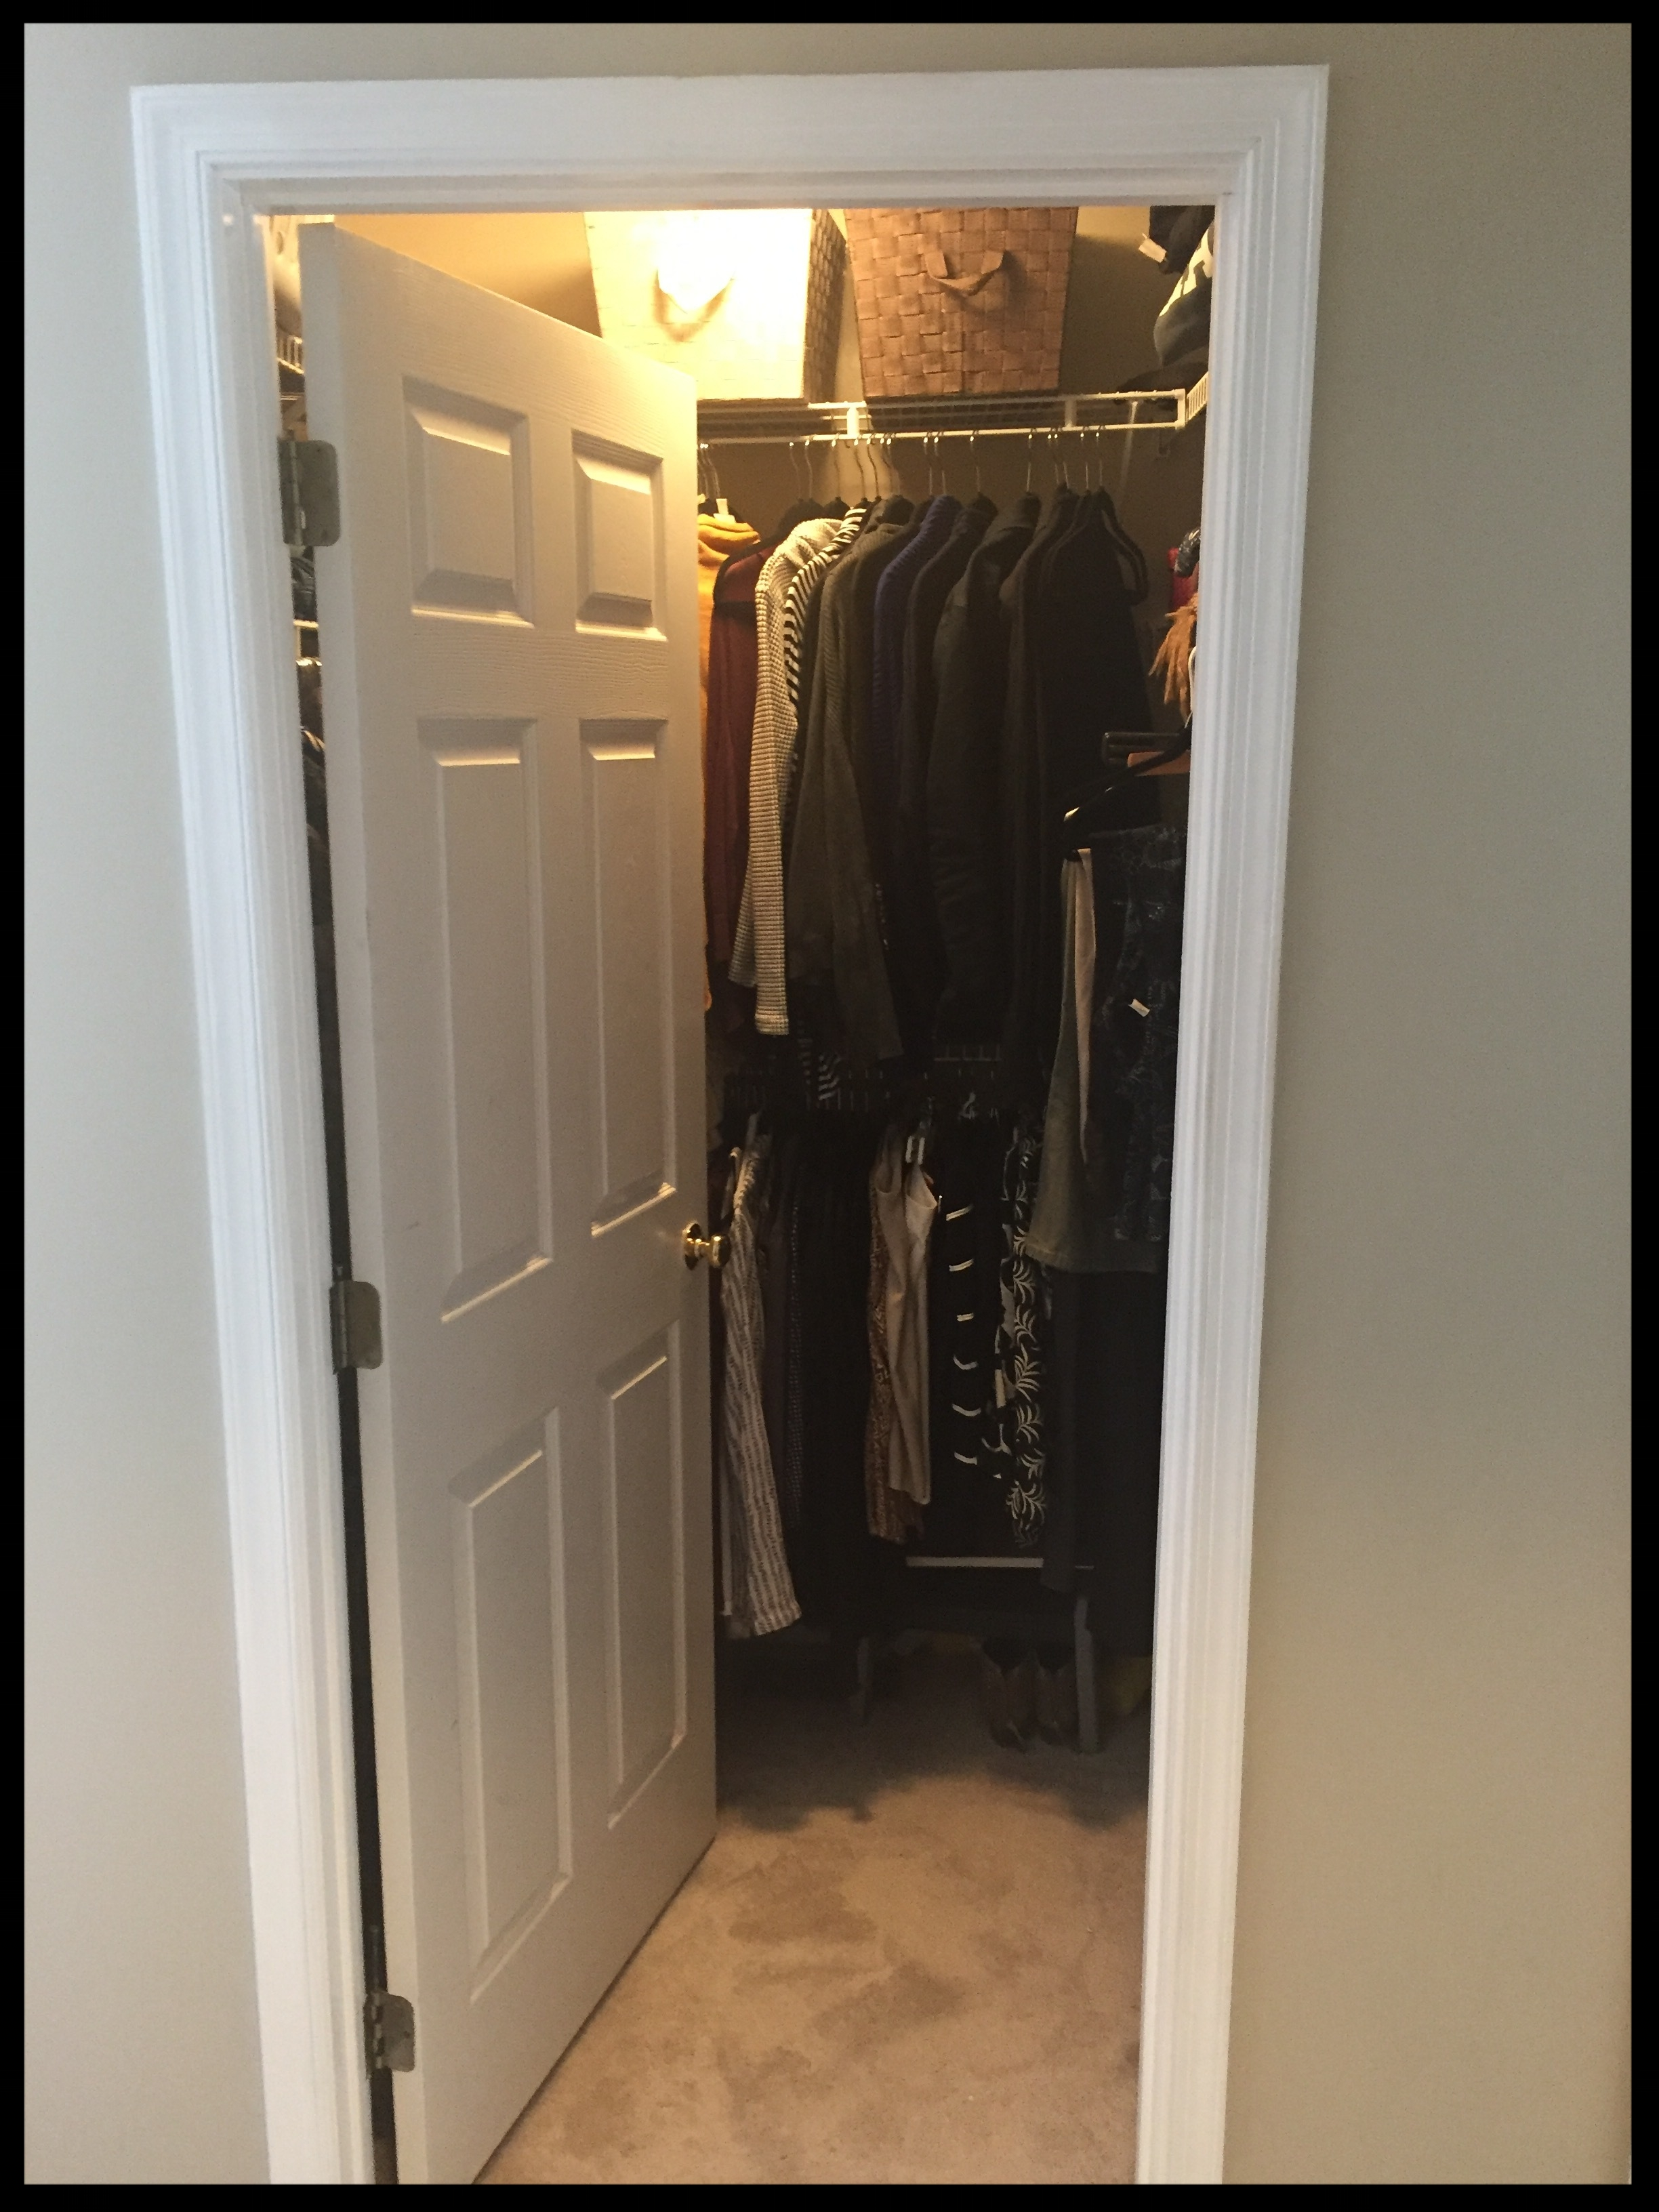 Poorly designed closet door - Blocks access to closet contents